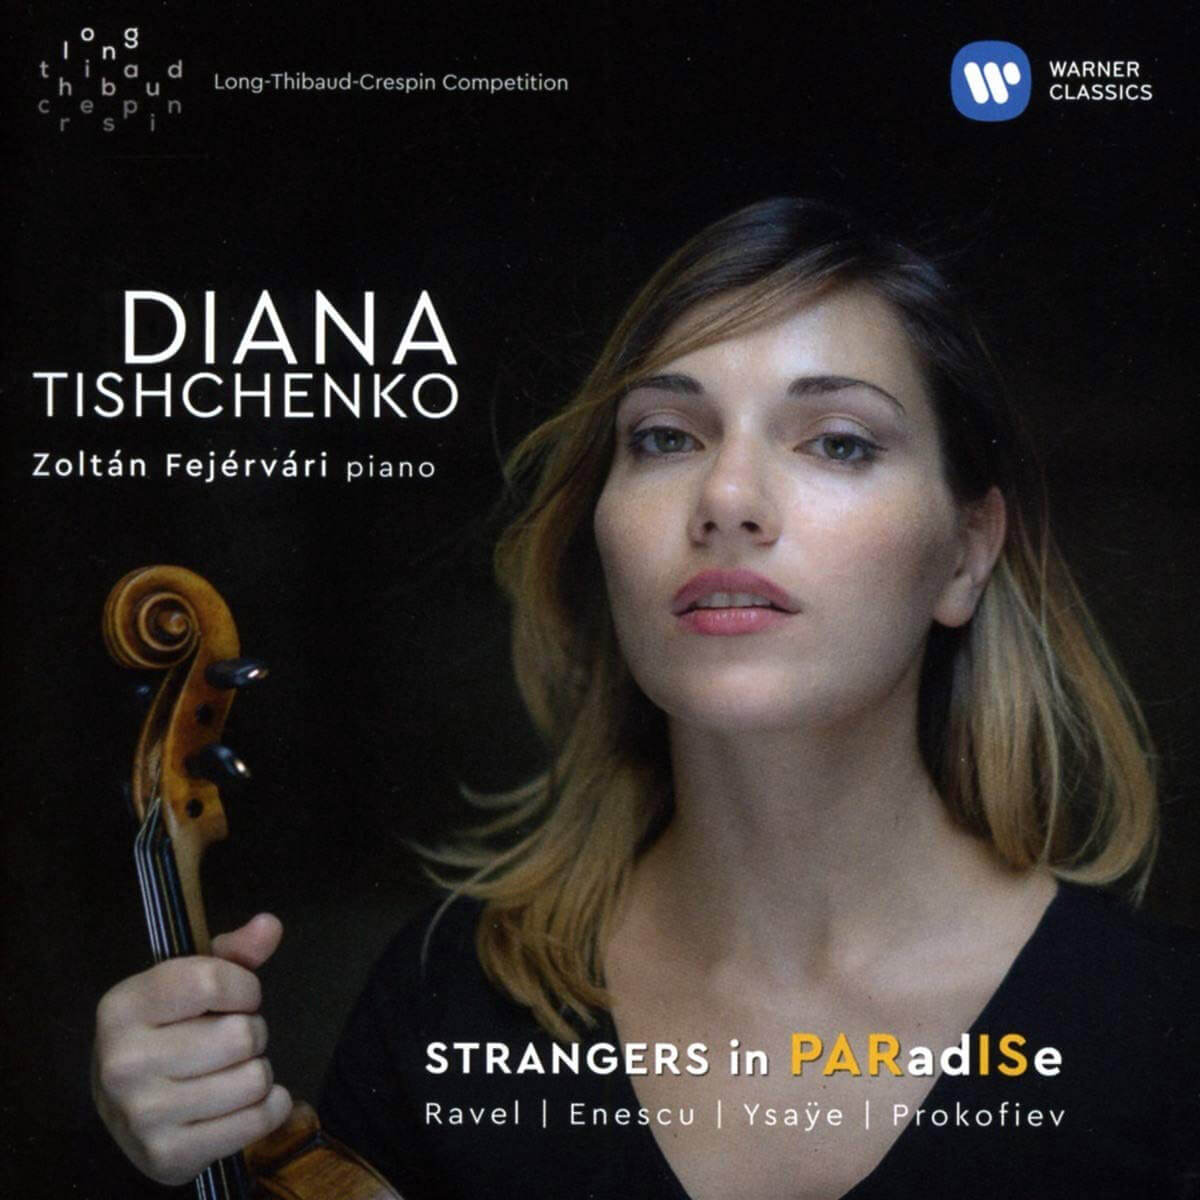 Diana Tishchenko and Zoltan Fejervari: STRANGERS in PARadISe (Warner Classics)